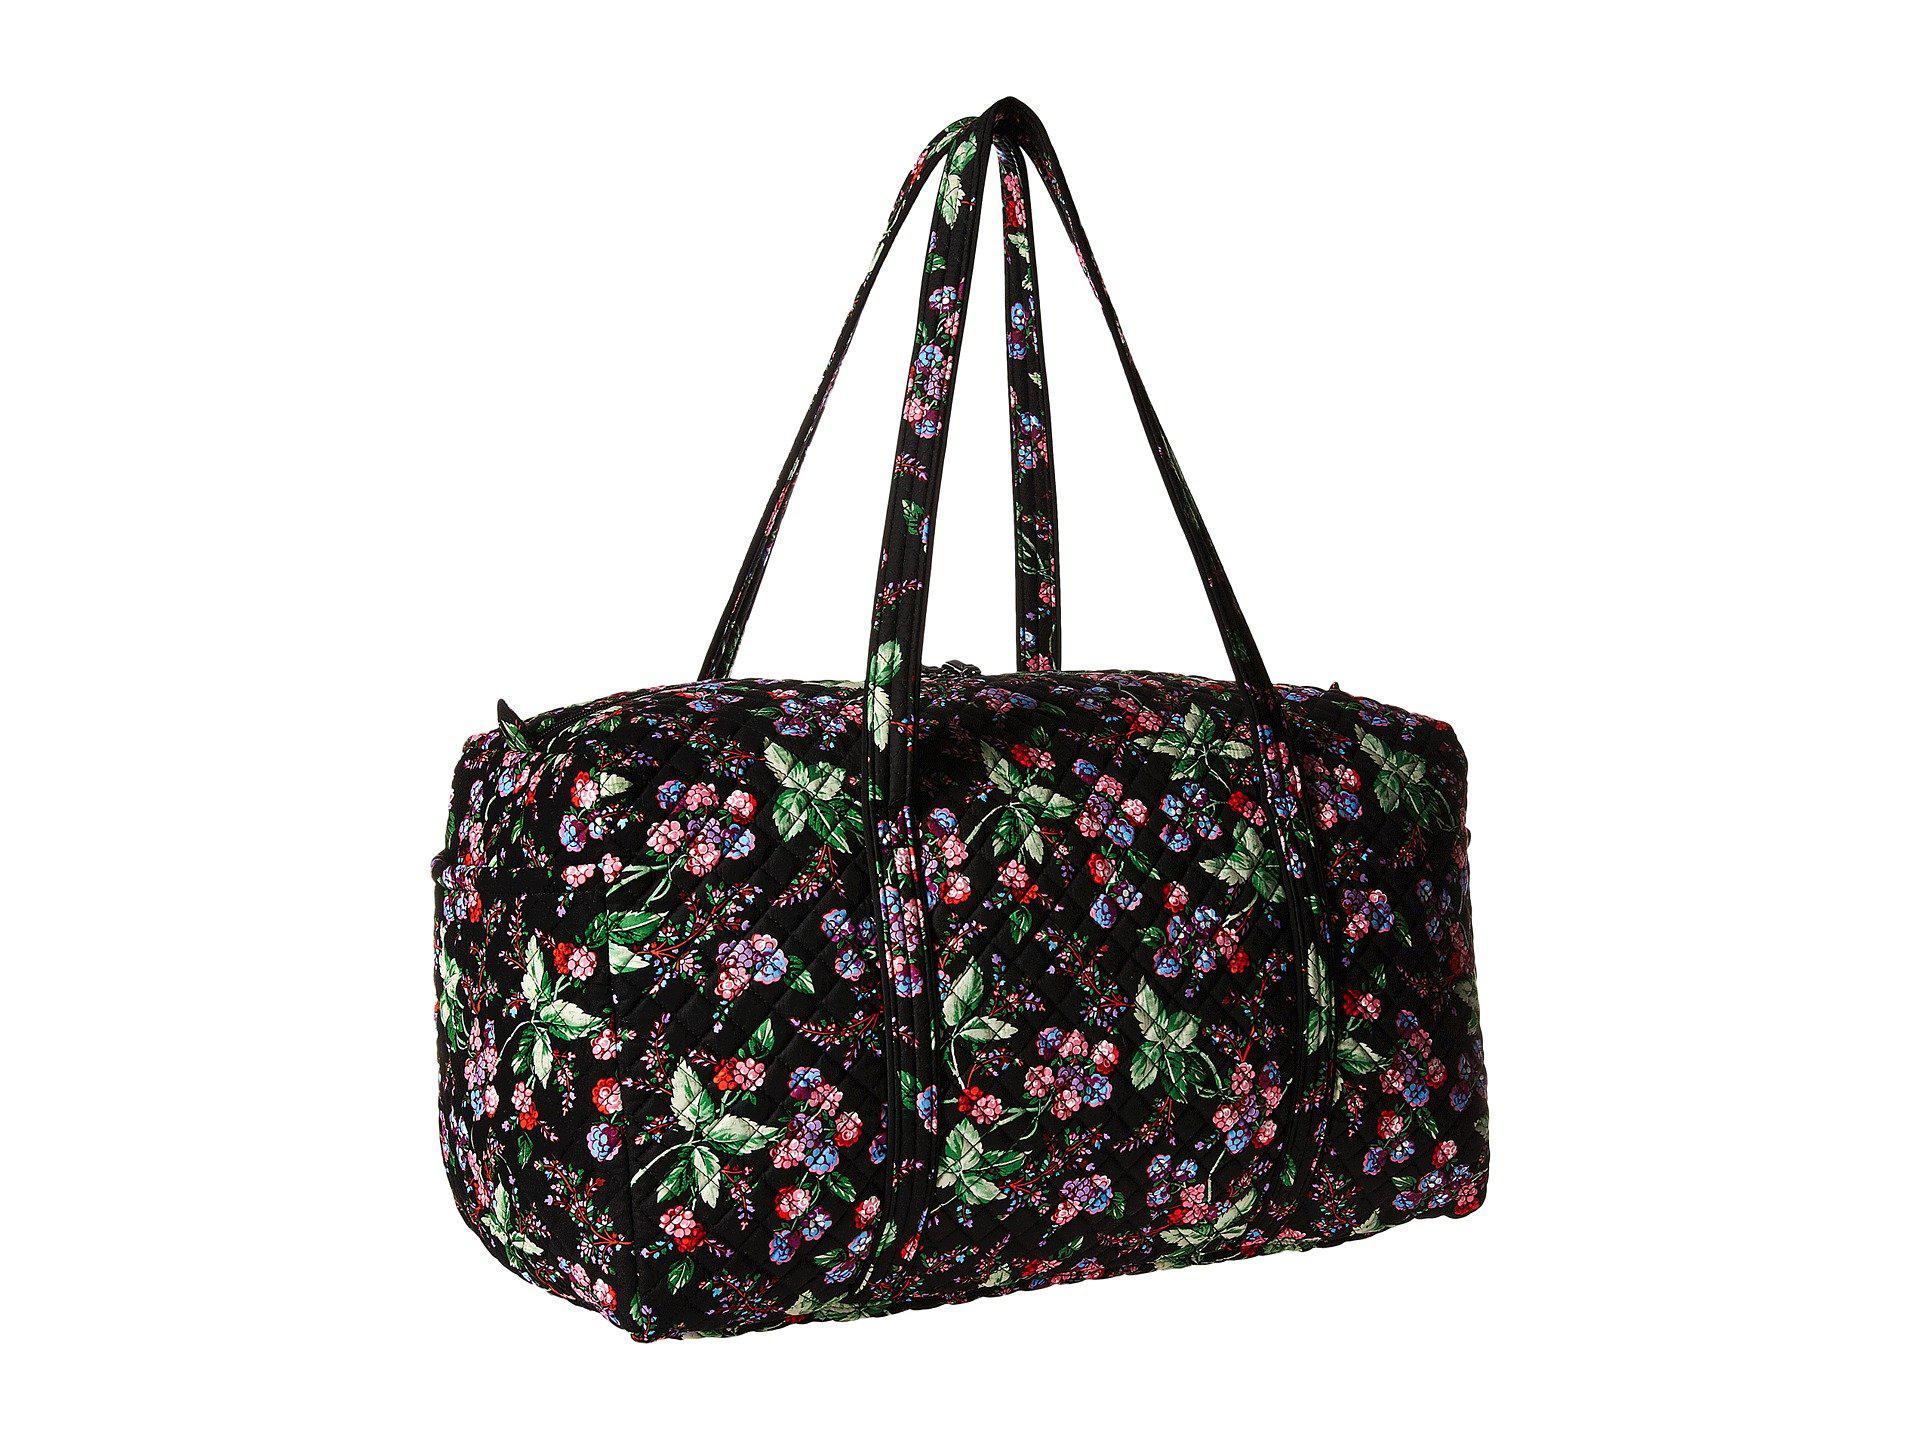 953e899607 Vera Bradley - Iconic Large Travel Duffel (classic Black) Duffel Bags -  Lyst. View fullscreen